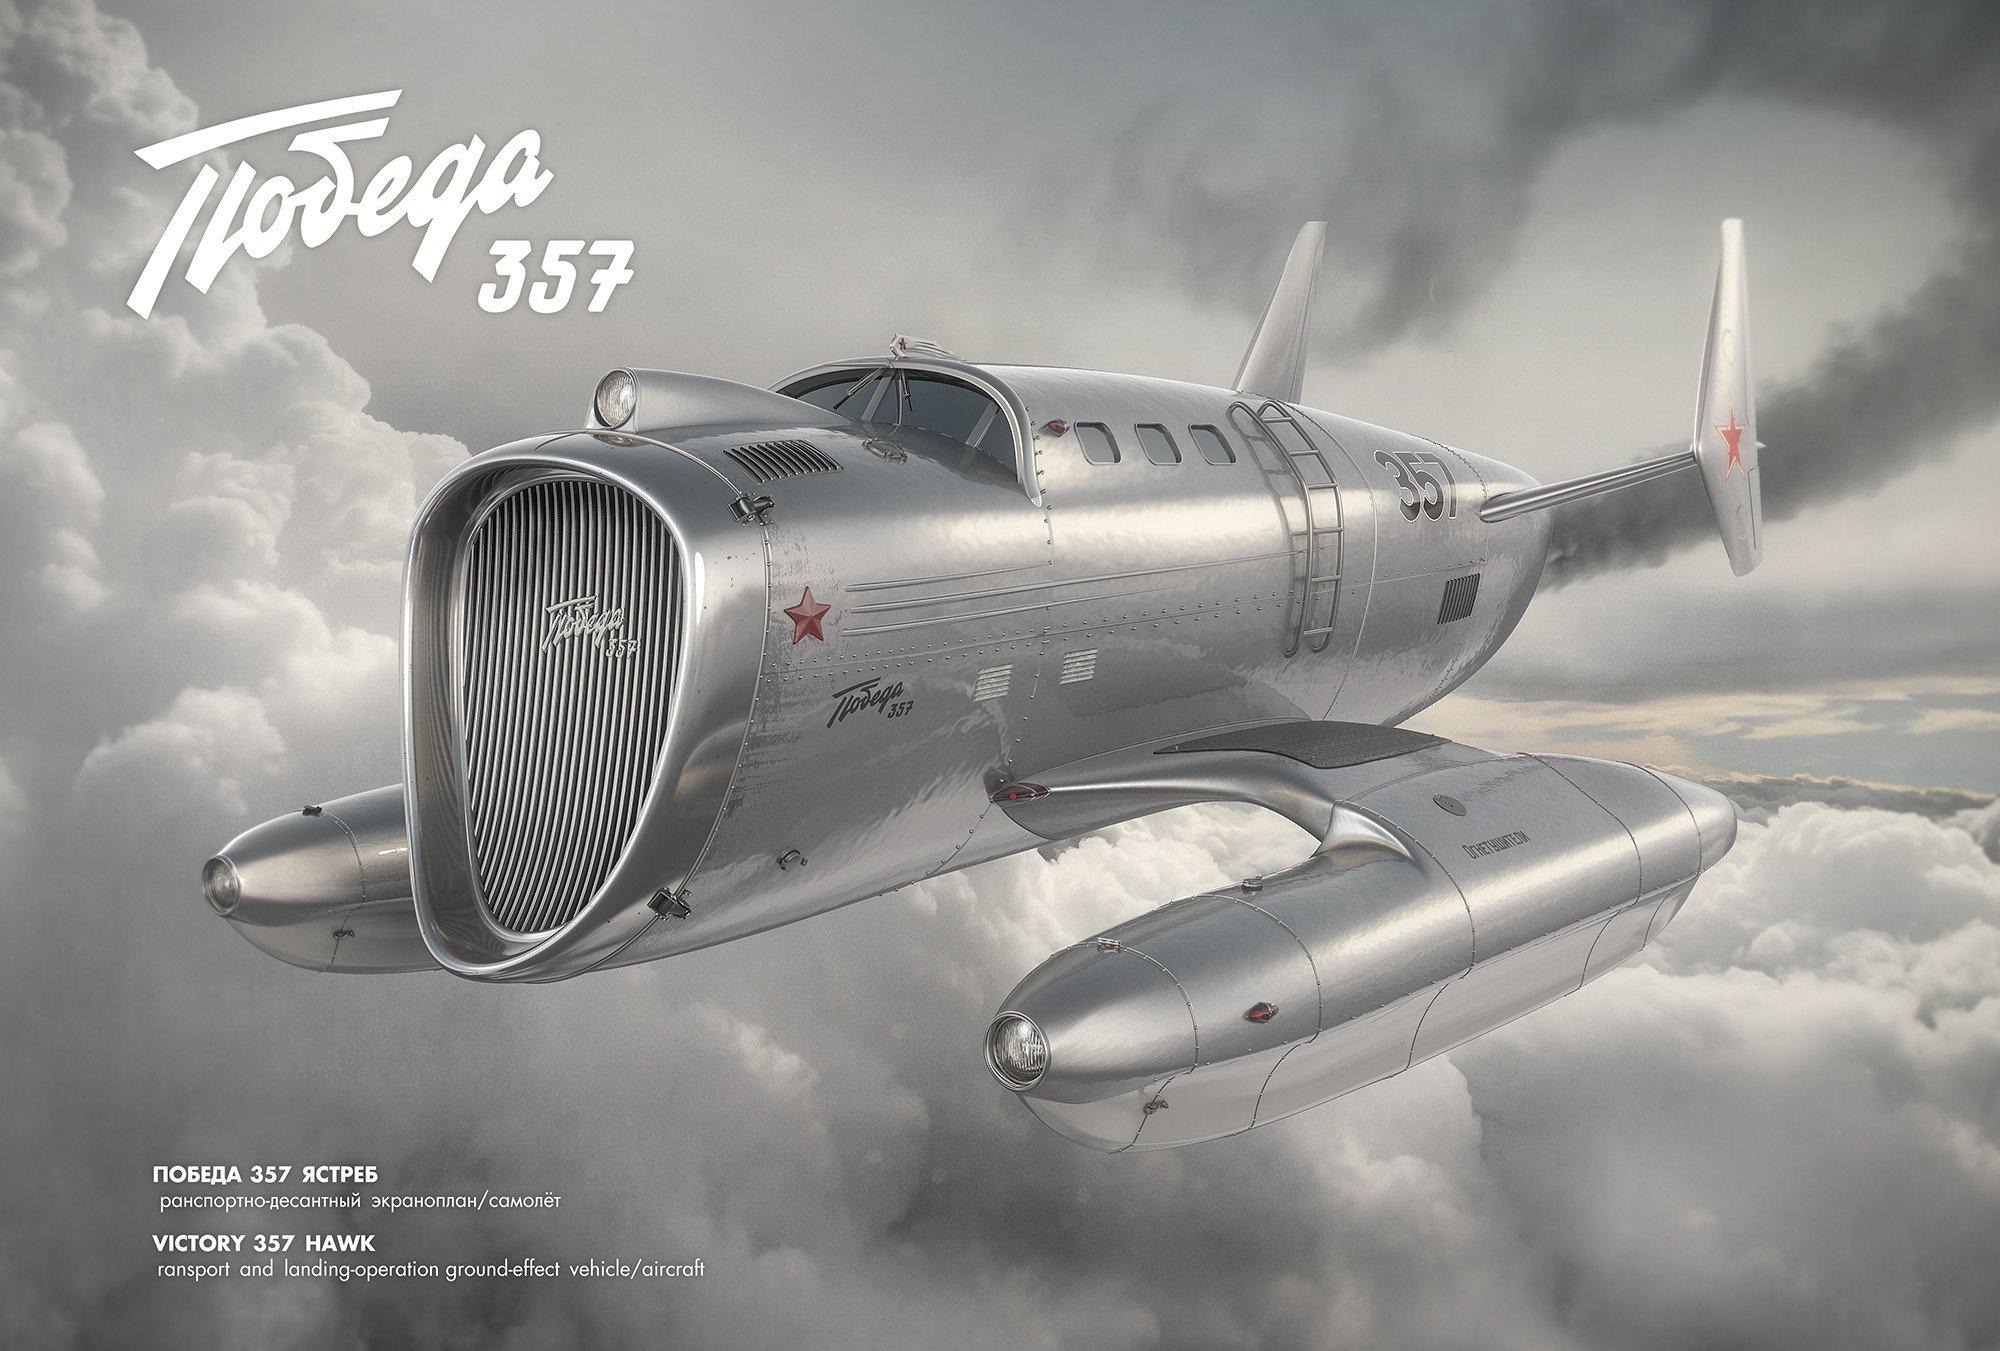 Victory 357